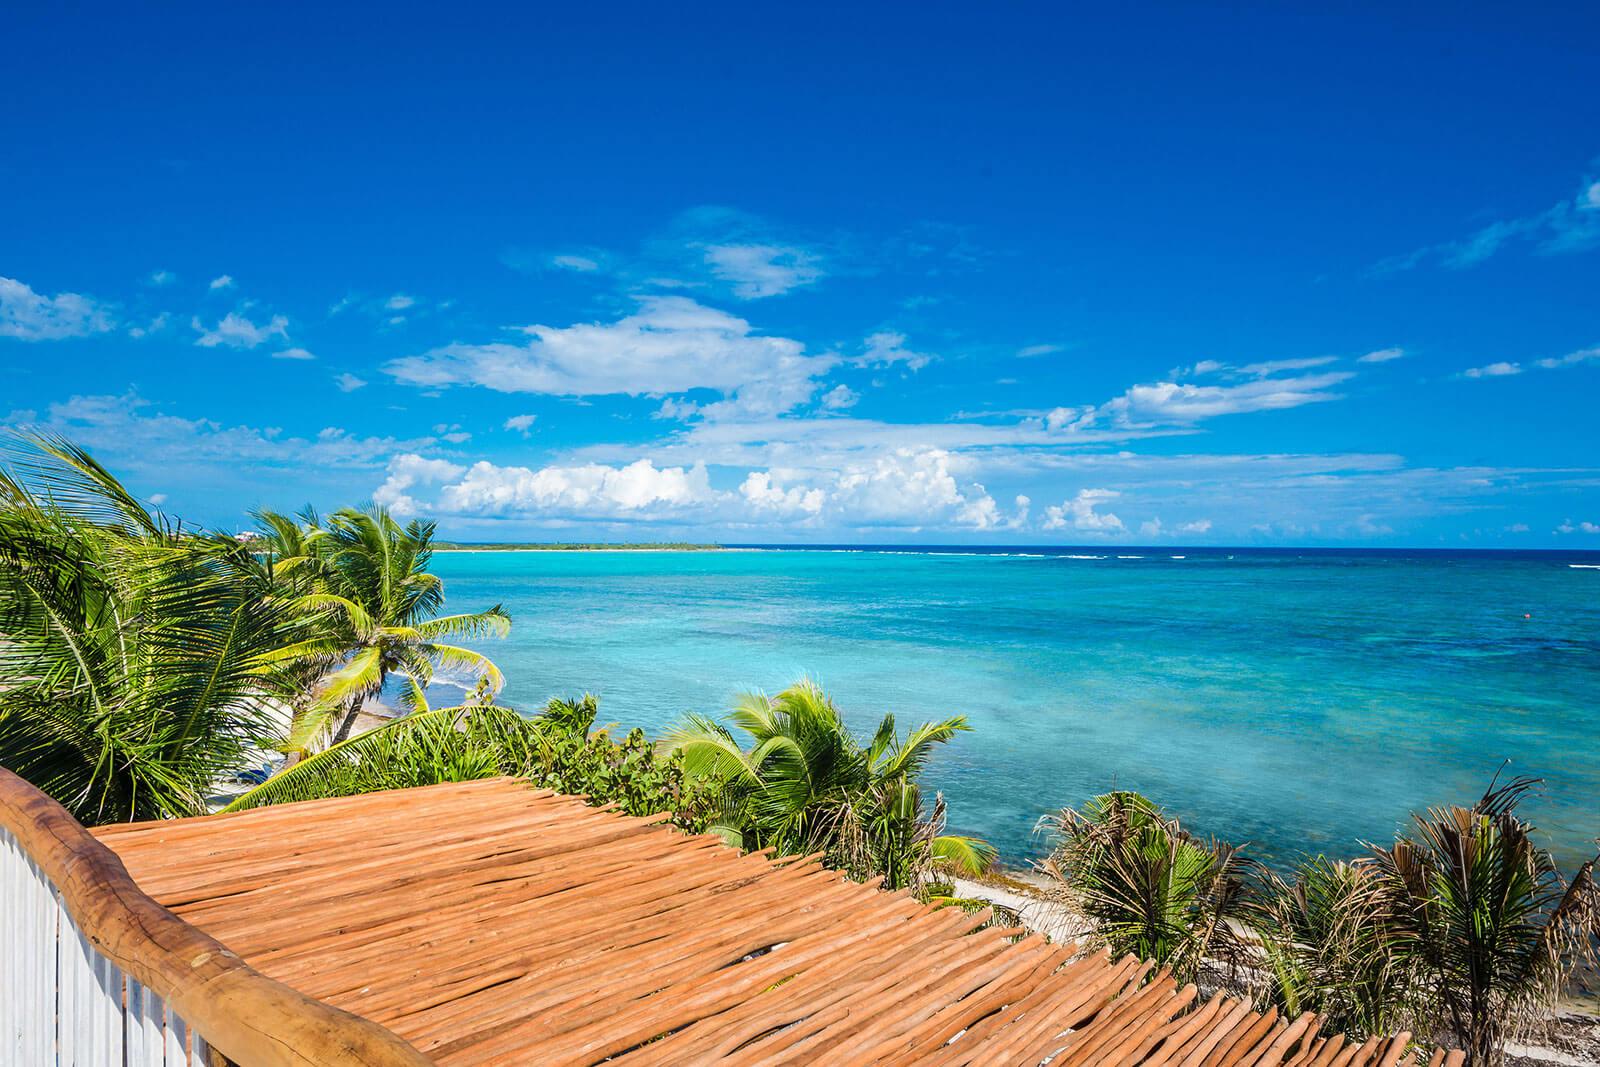 Maya_Luxe_Riviera_Maya_Luxury_Villas_Experiences_Tulum_Soliman_Bay_5_Bedrooms_3.jpg